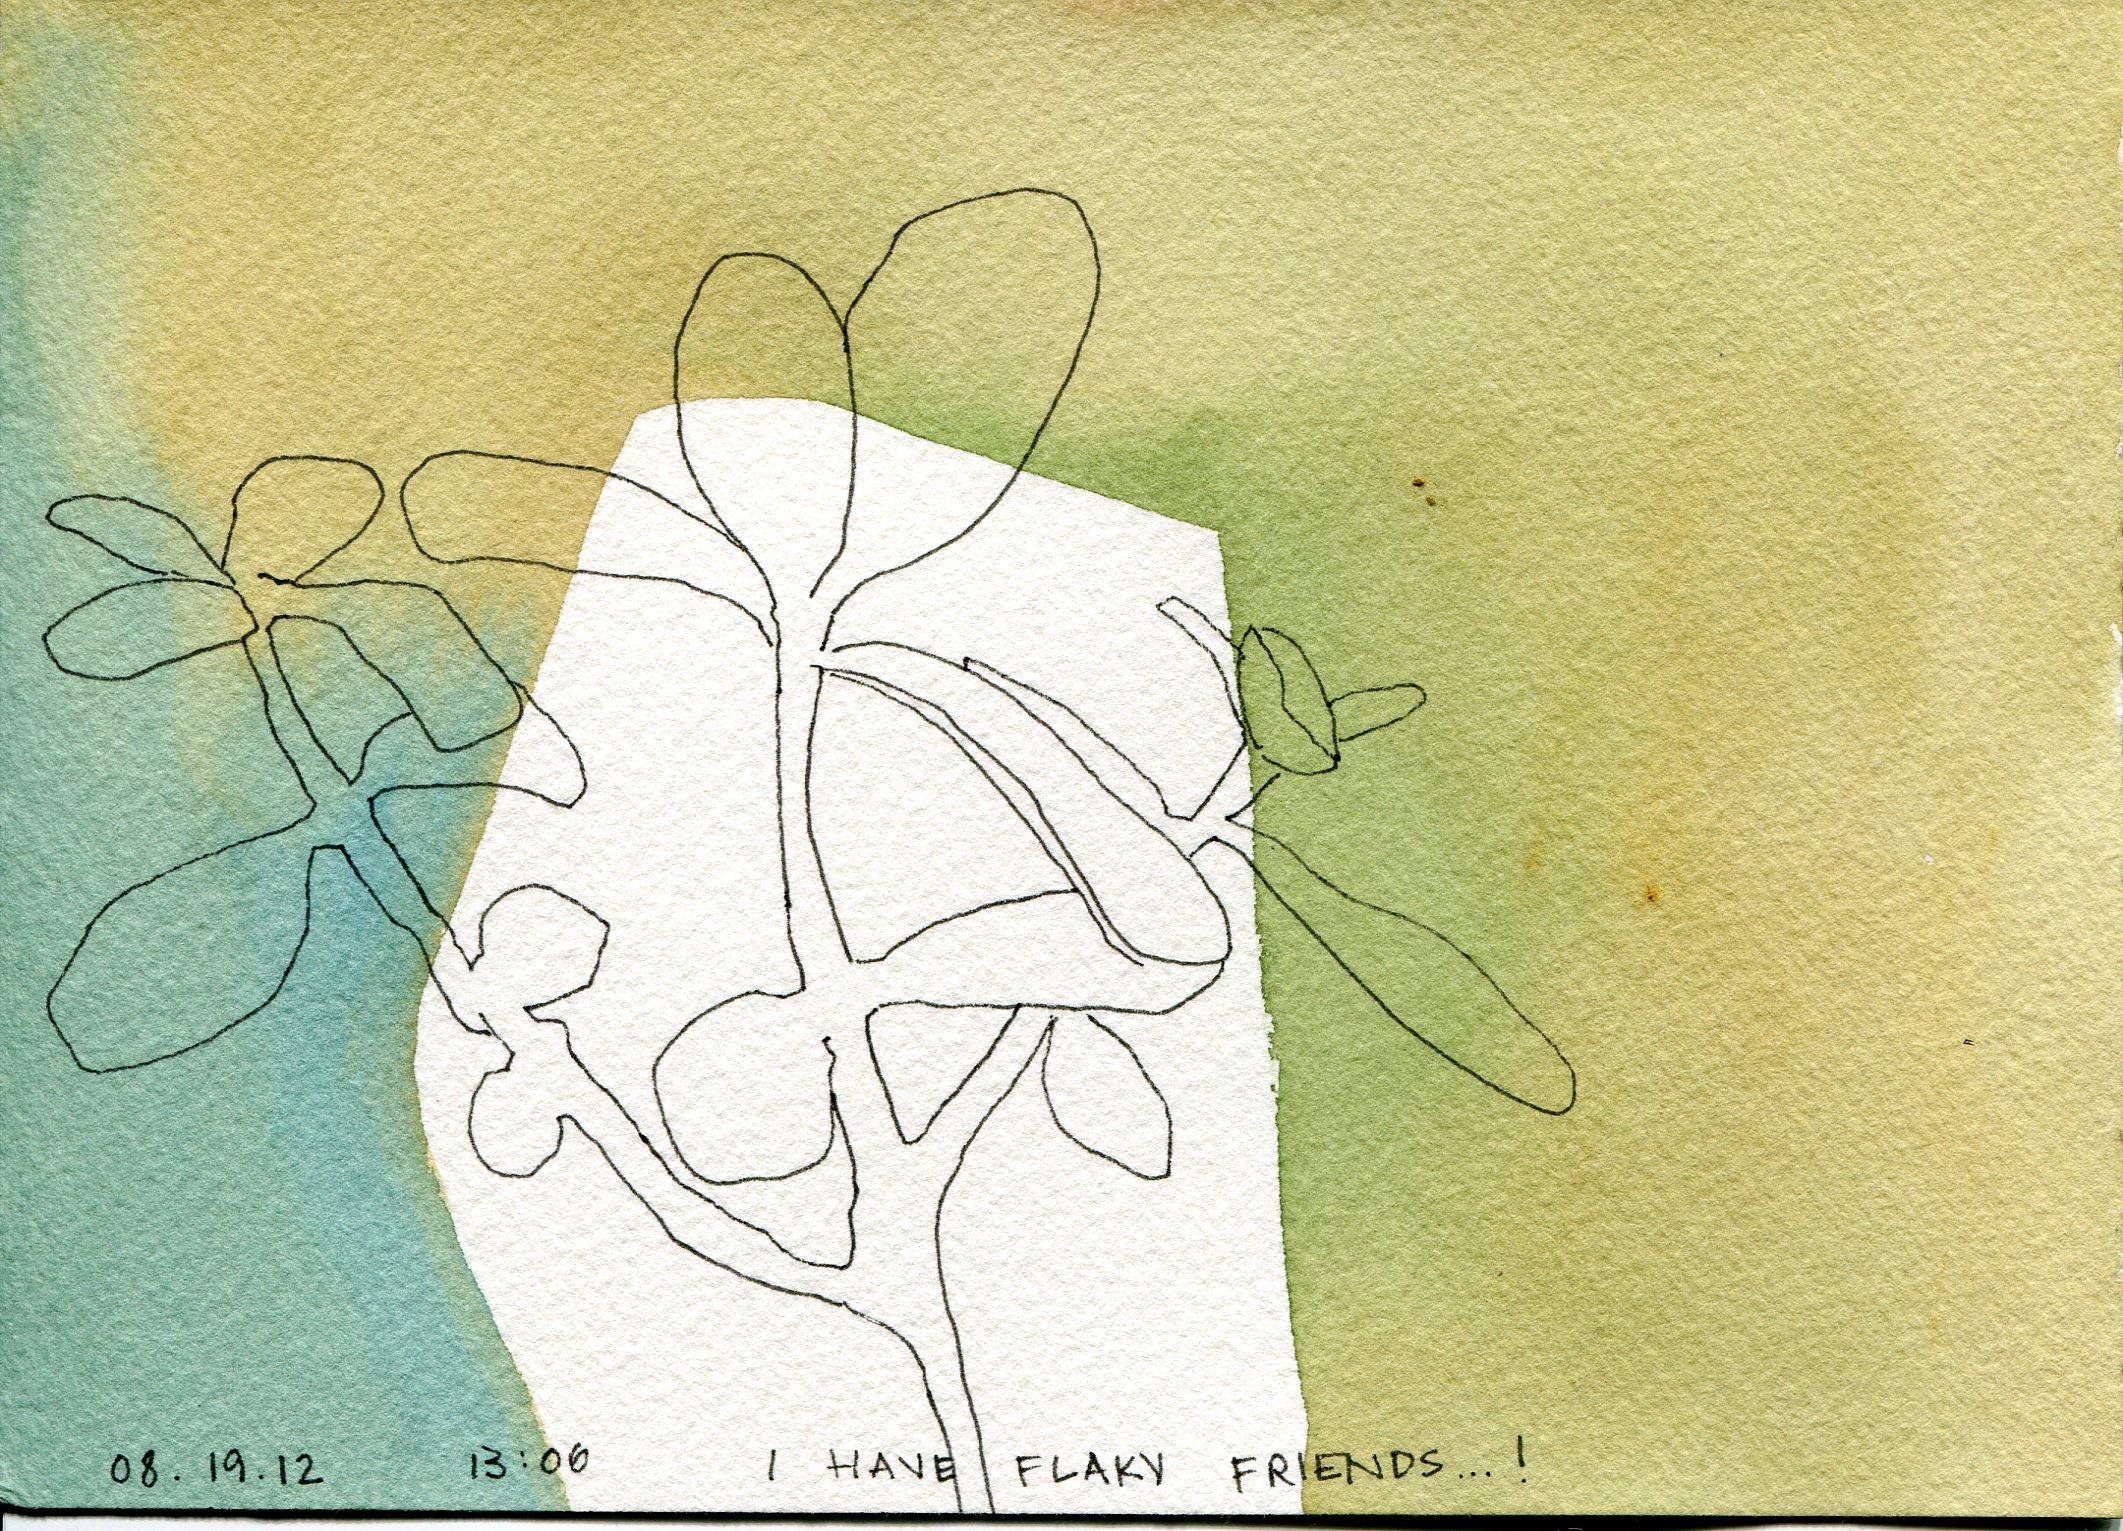 2012-08-19 drawing006.jpg